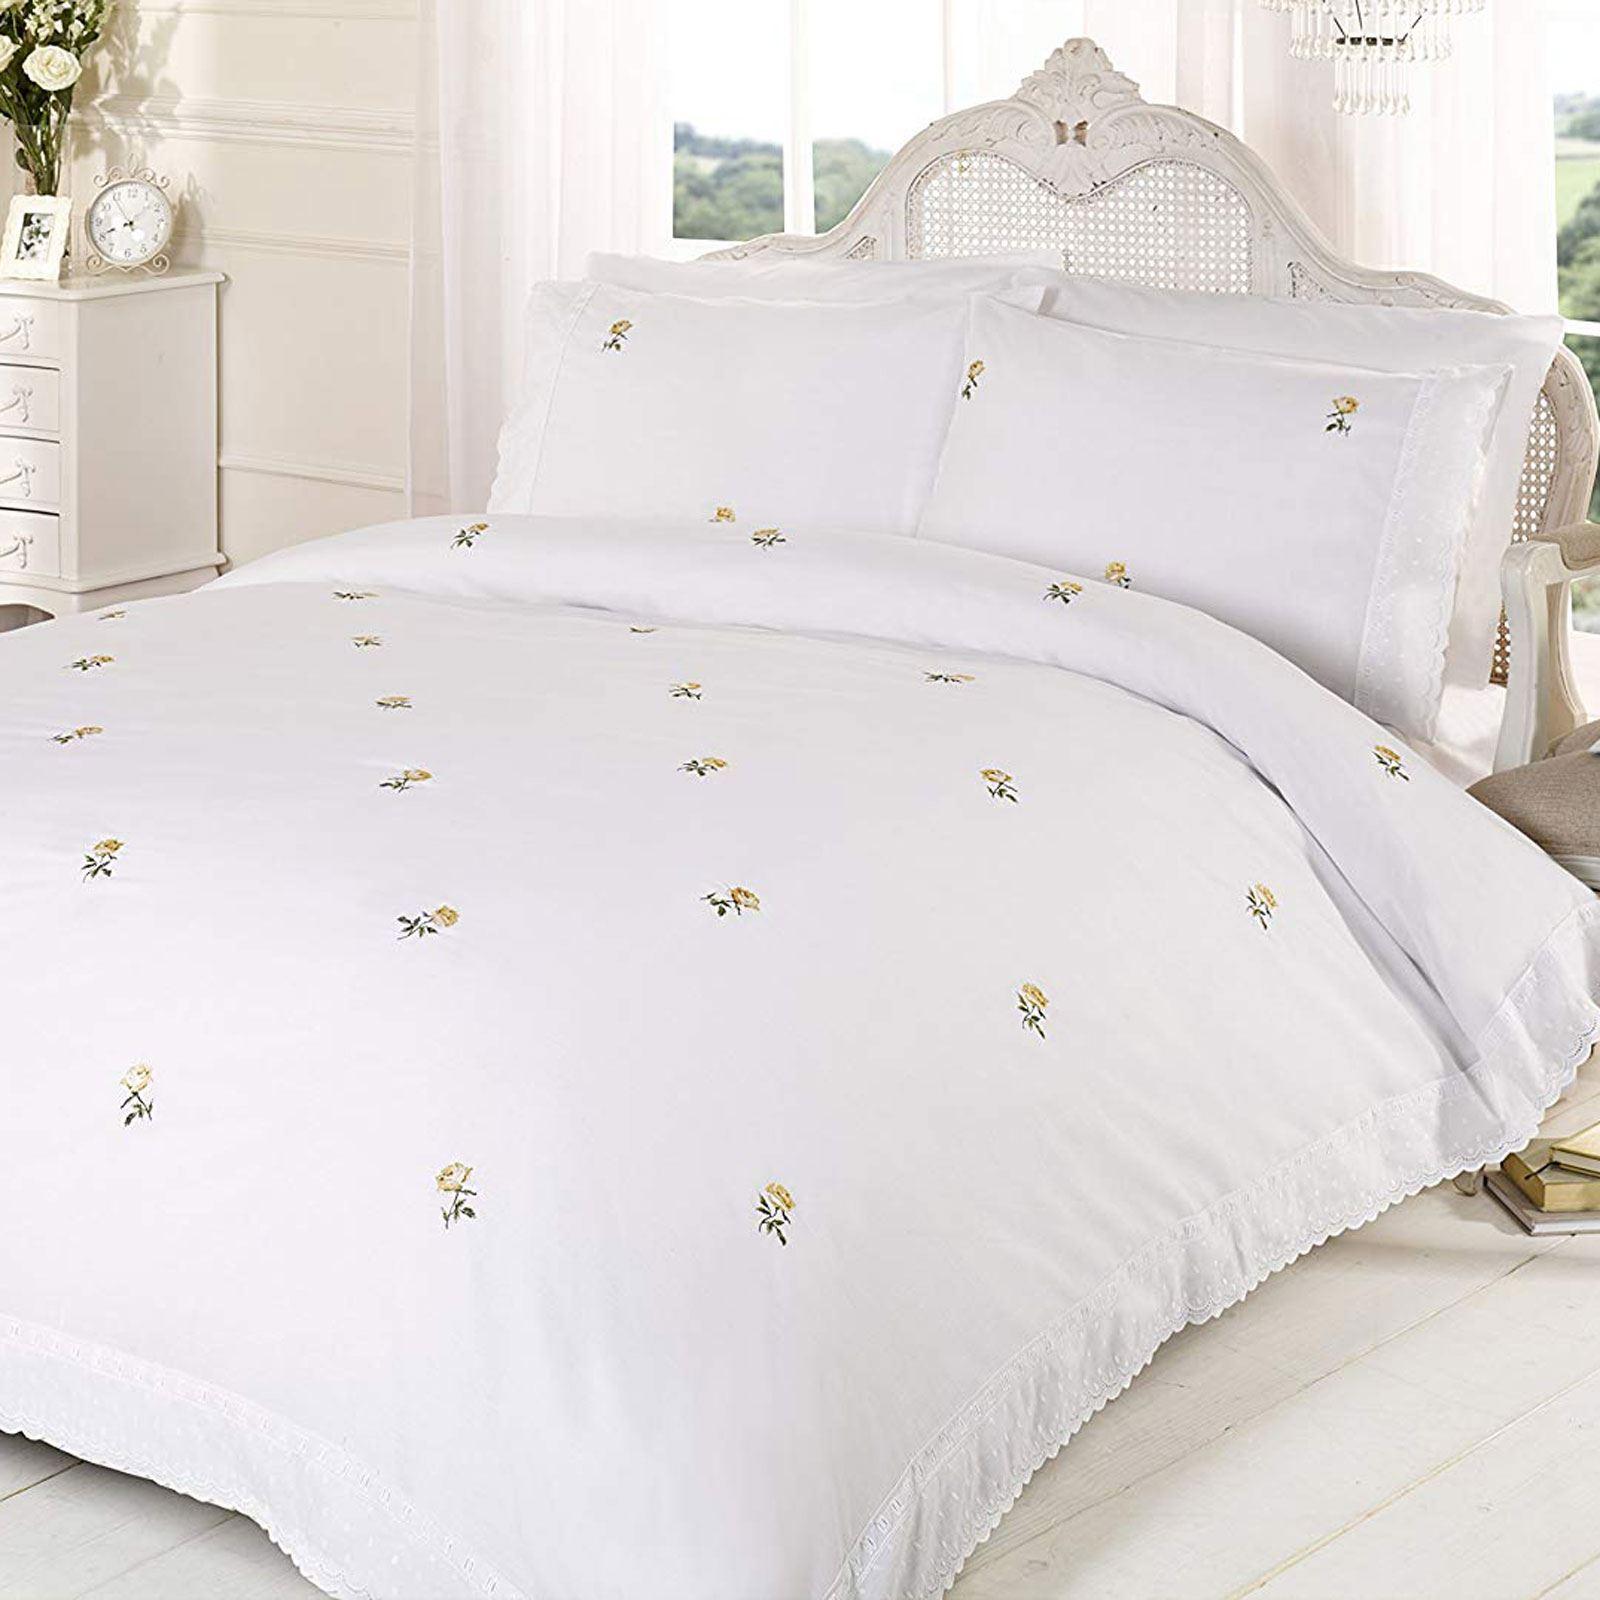 Alicia Floral White Yellow Duvet Cover Pillowcase Set Single 5027491957700 Ebay